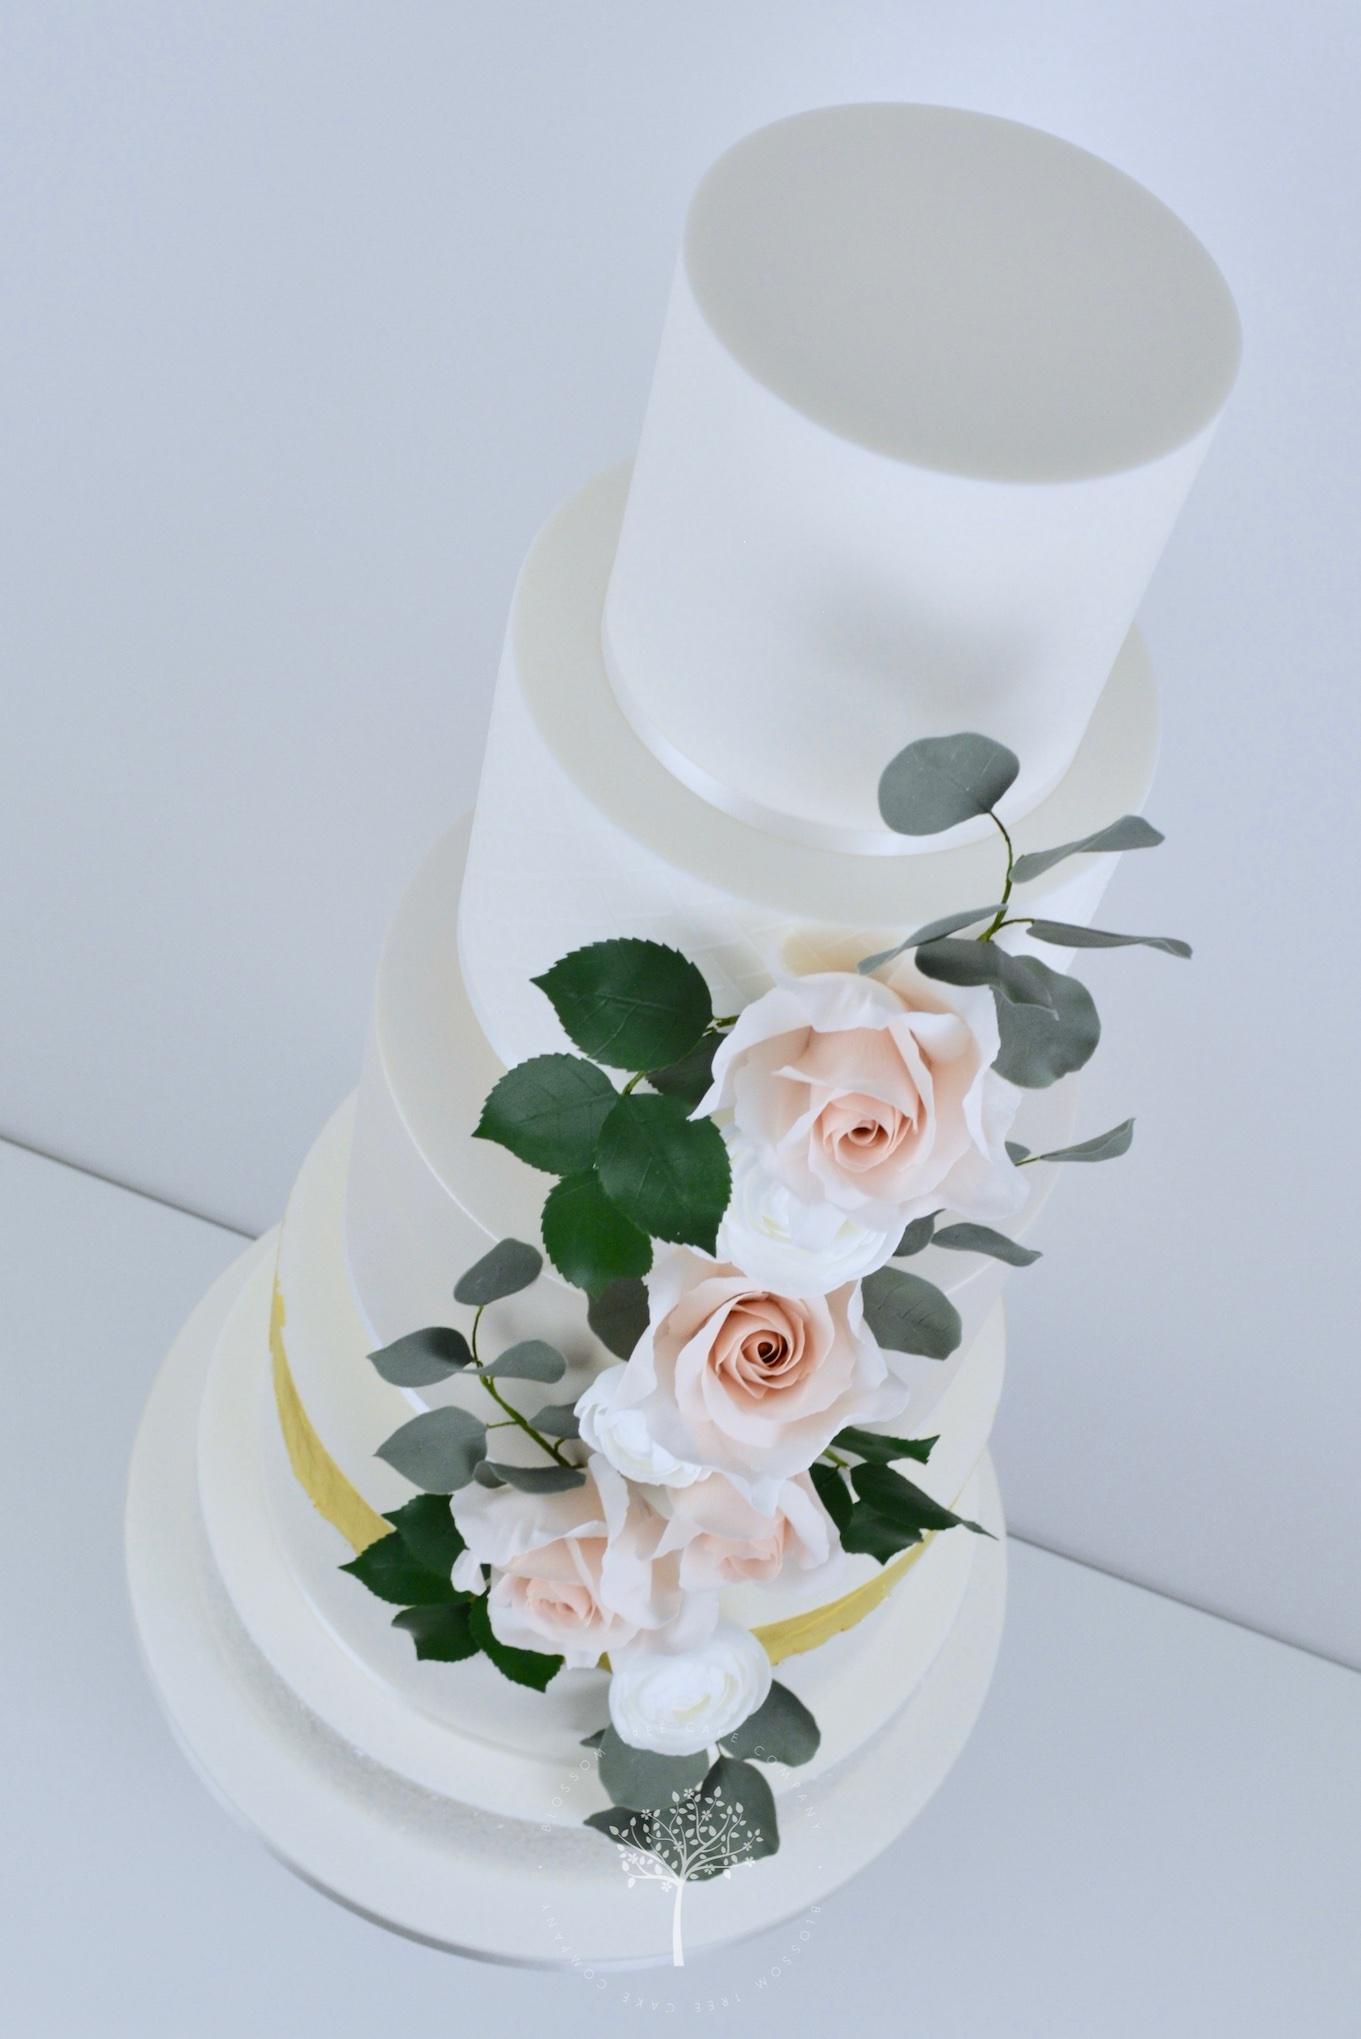 Rose & Ranunculus Cascade wedding cake by Blossom Tree Cake Company Harrogate North Yorkshire - angle.jpg